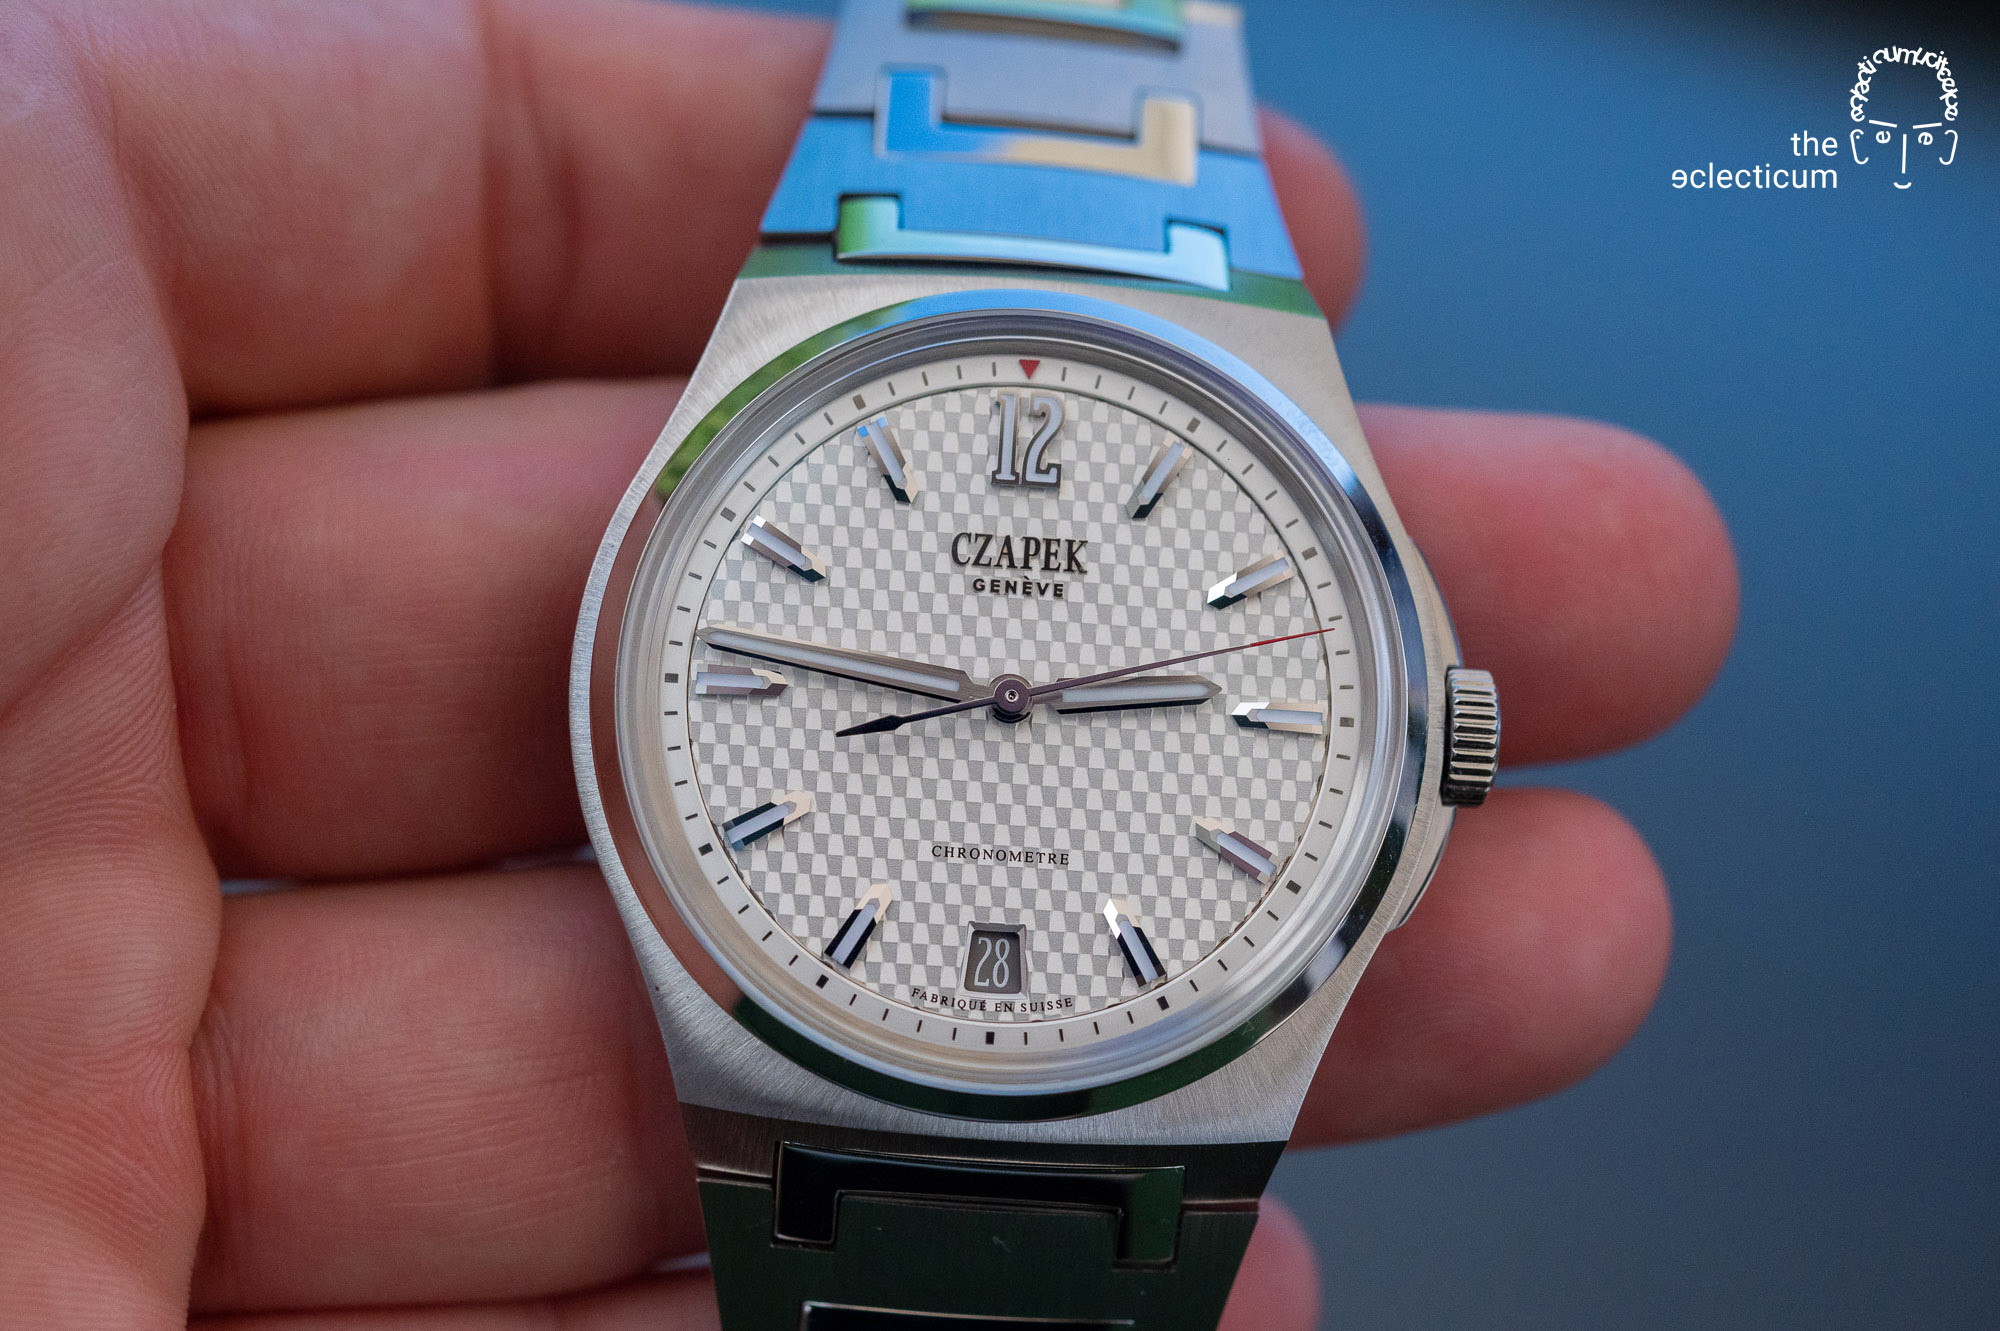 Czapek & Cie Antarctique Passage de Drake stainless steel sports watch